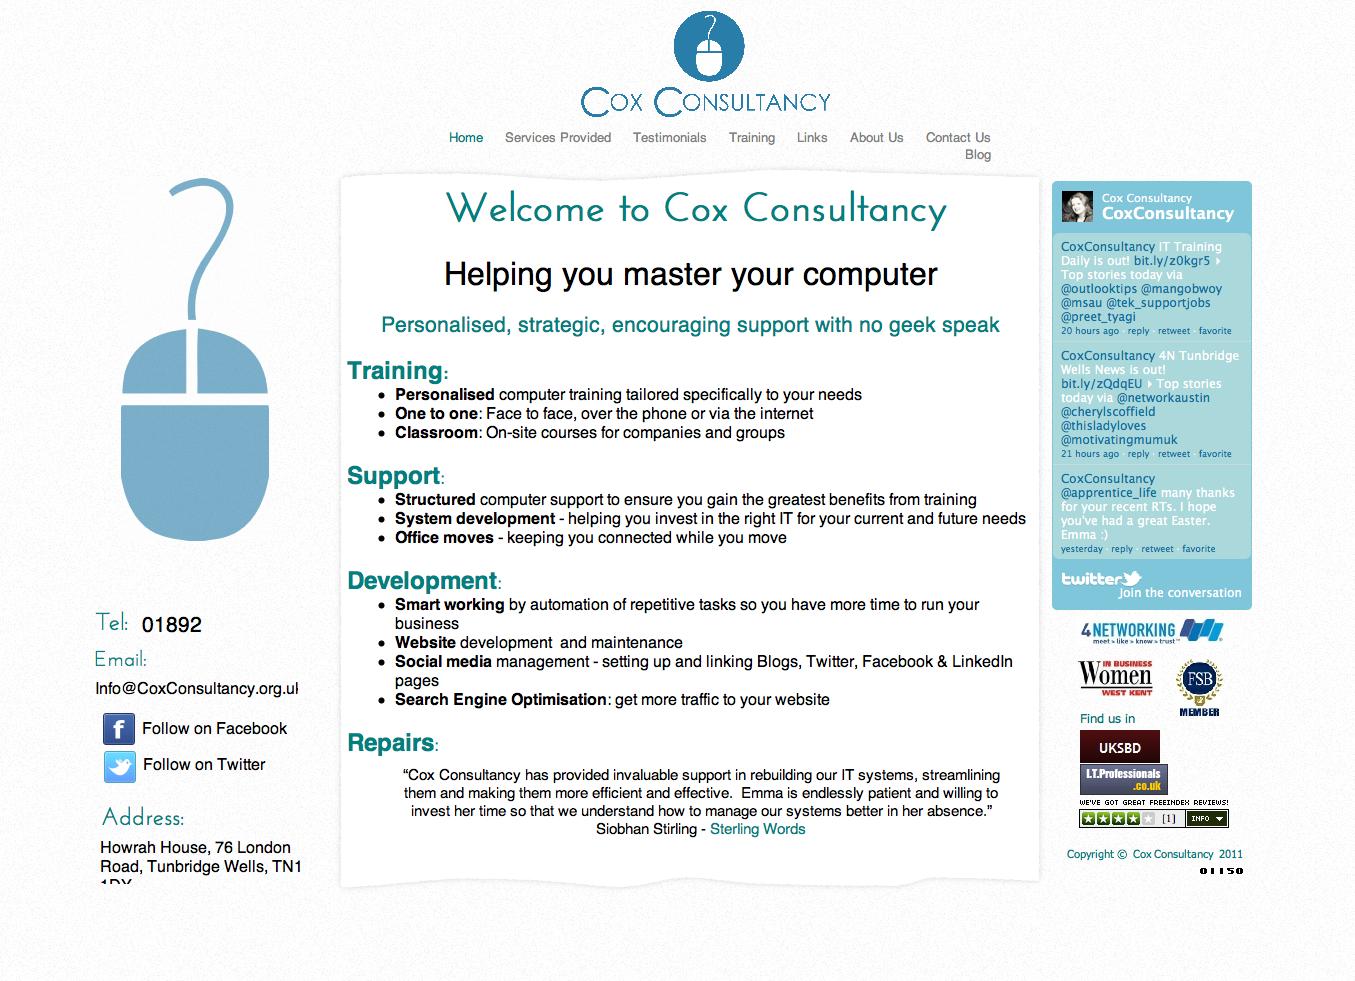 Cox Consultancy